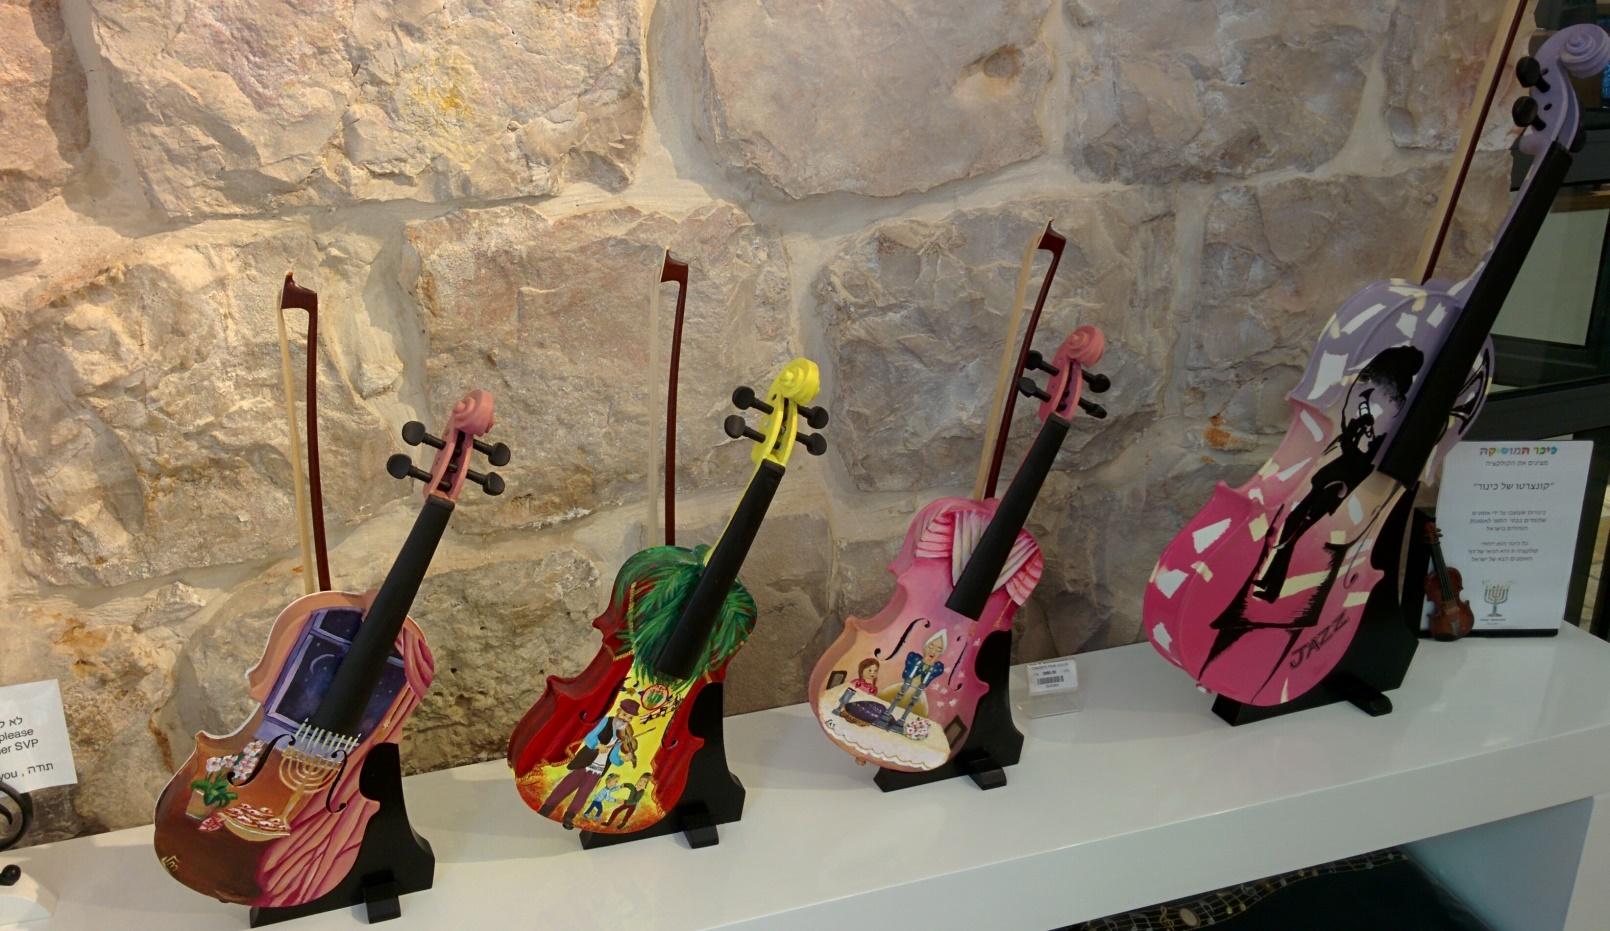 Musical merchandise in Kikar Hamusica Boutique. Photo by Abigail Klein Leichman